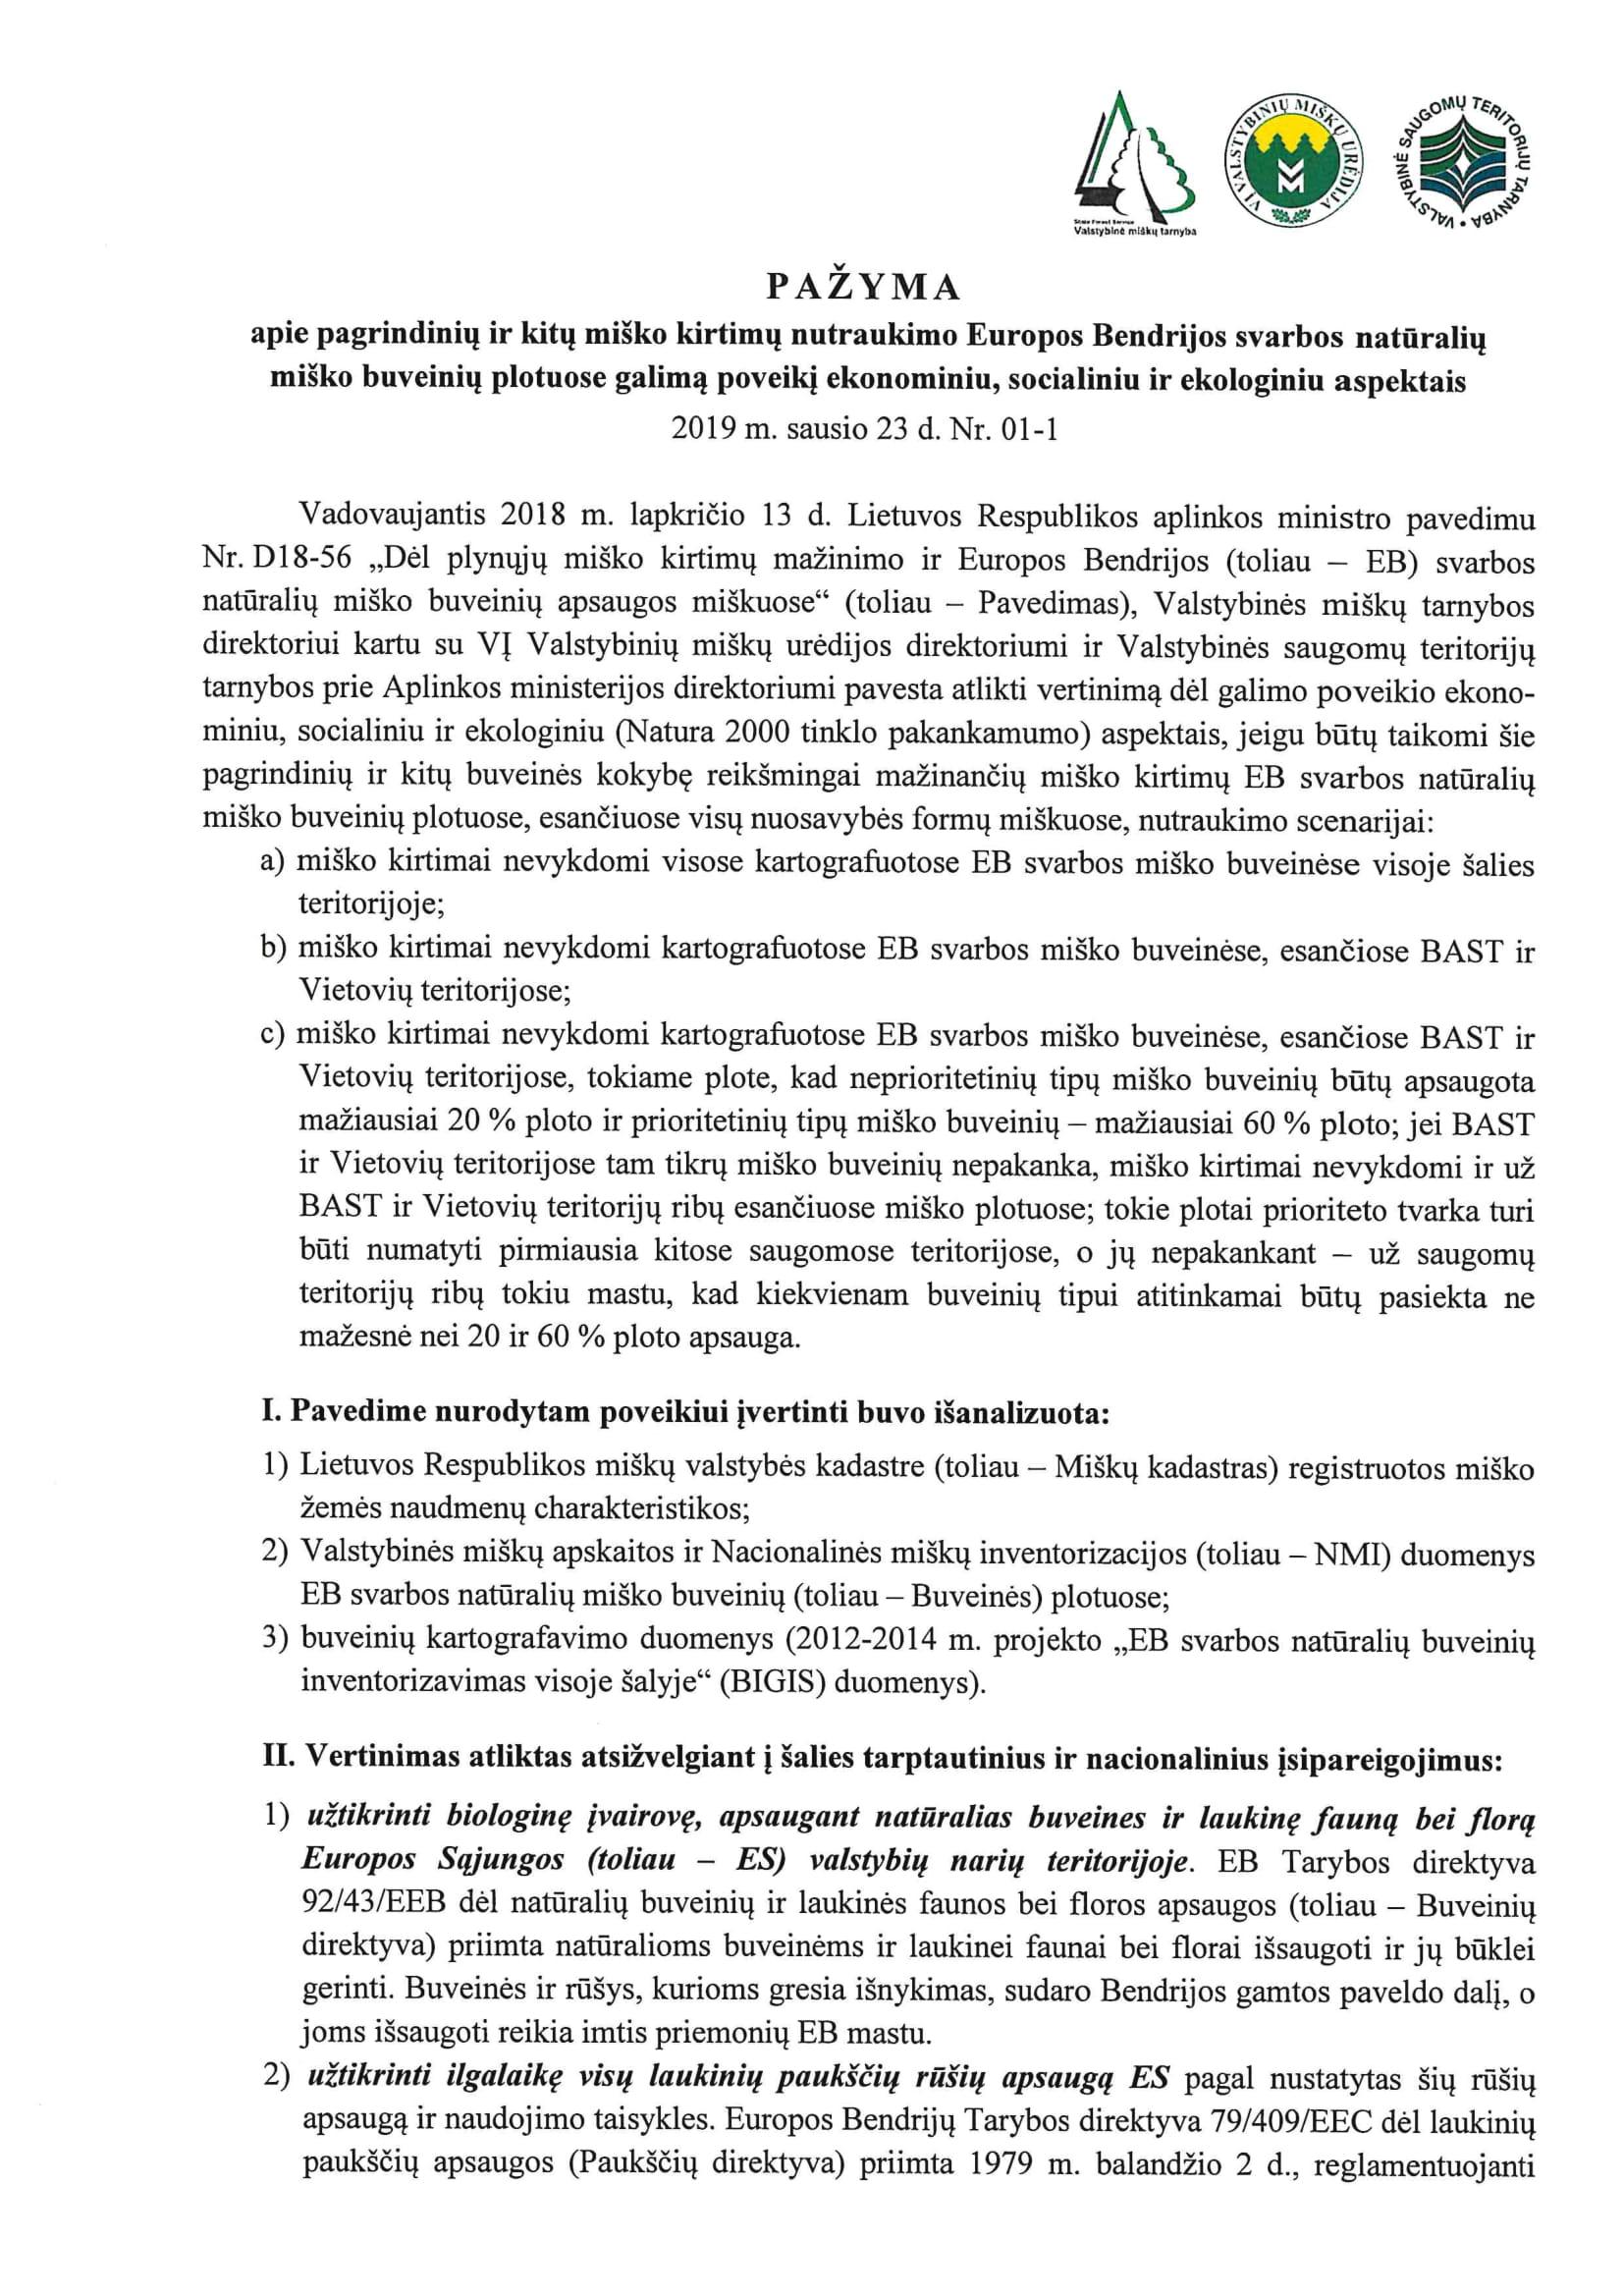 EB buveiniu Pazyma VMT VMU VSTT 2019.01.23 (su parasais)[38073]-01